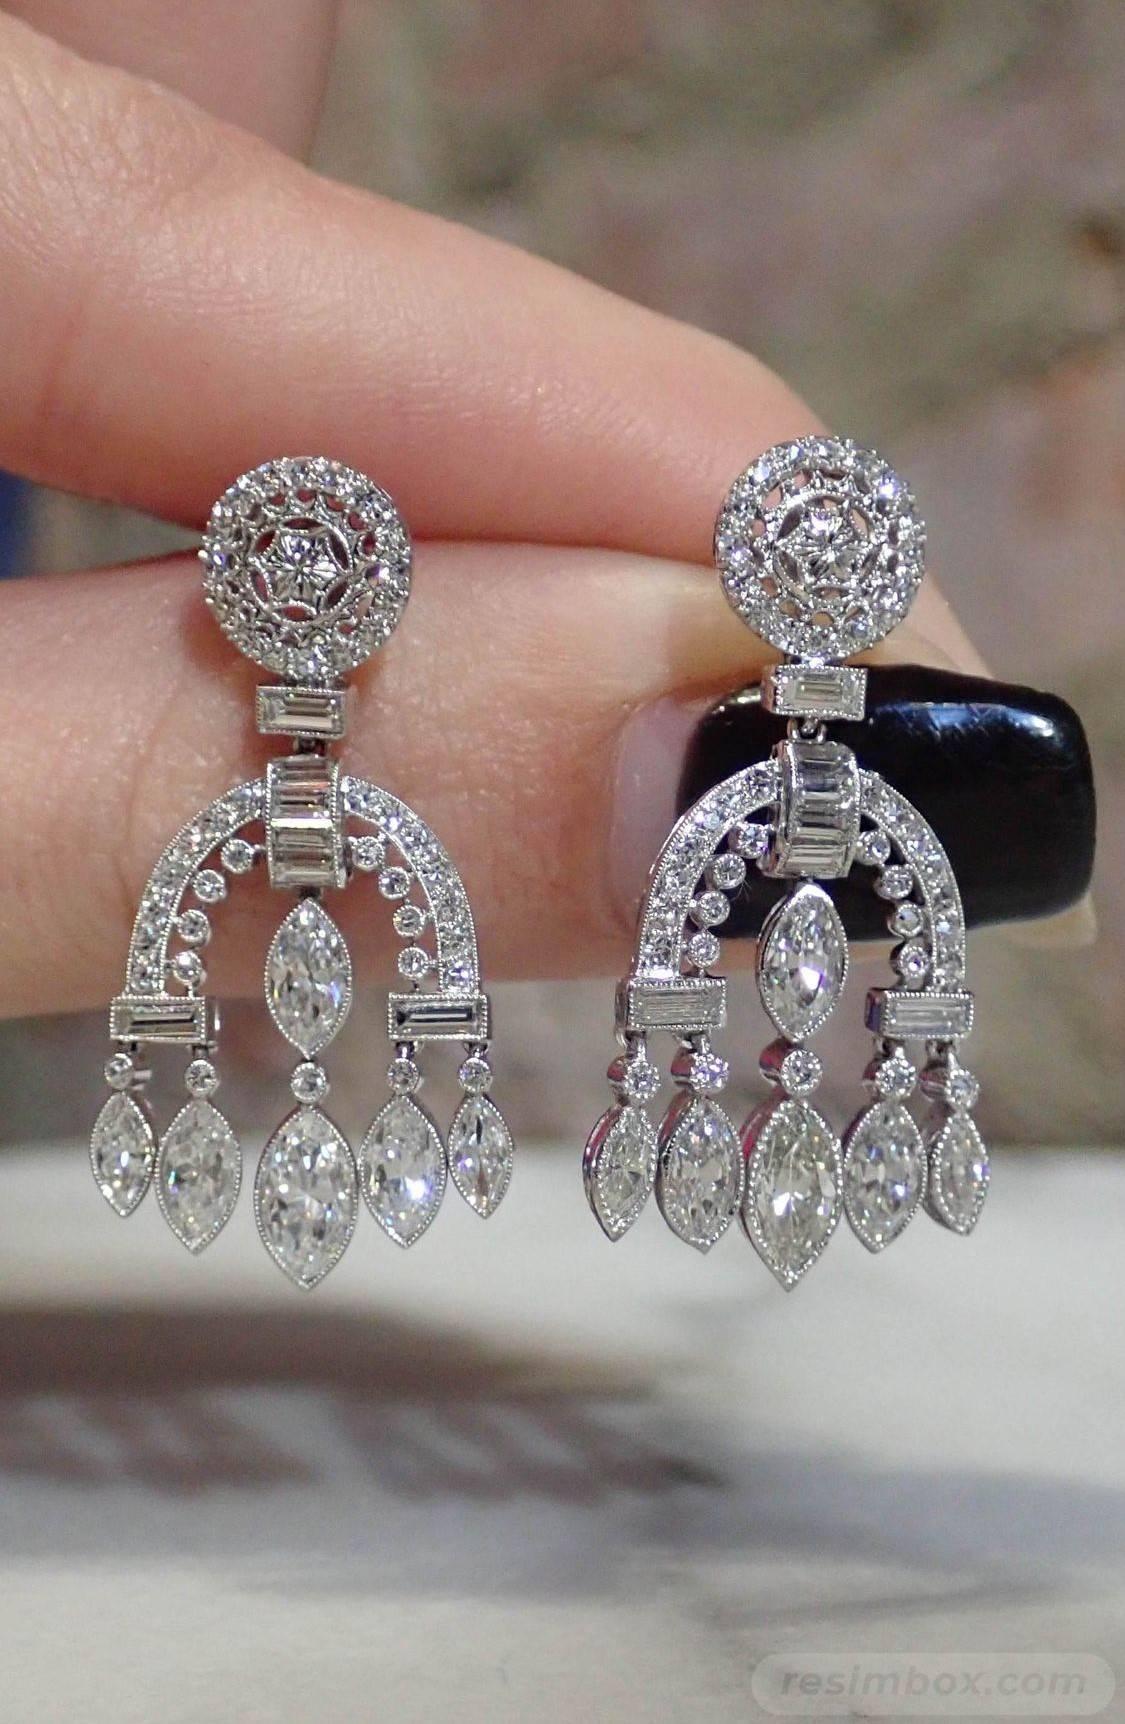 Art deco jewelry-104638391329716963